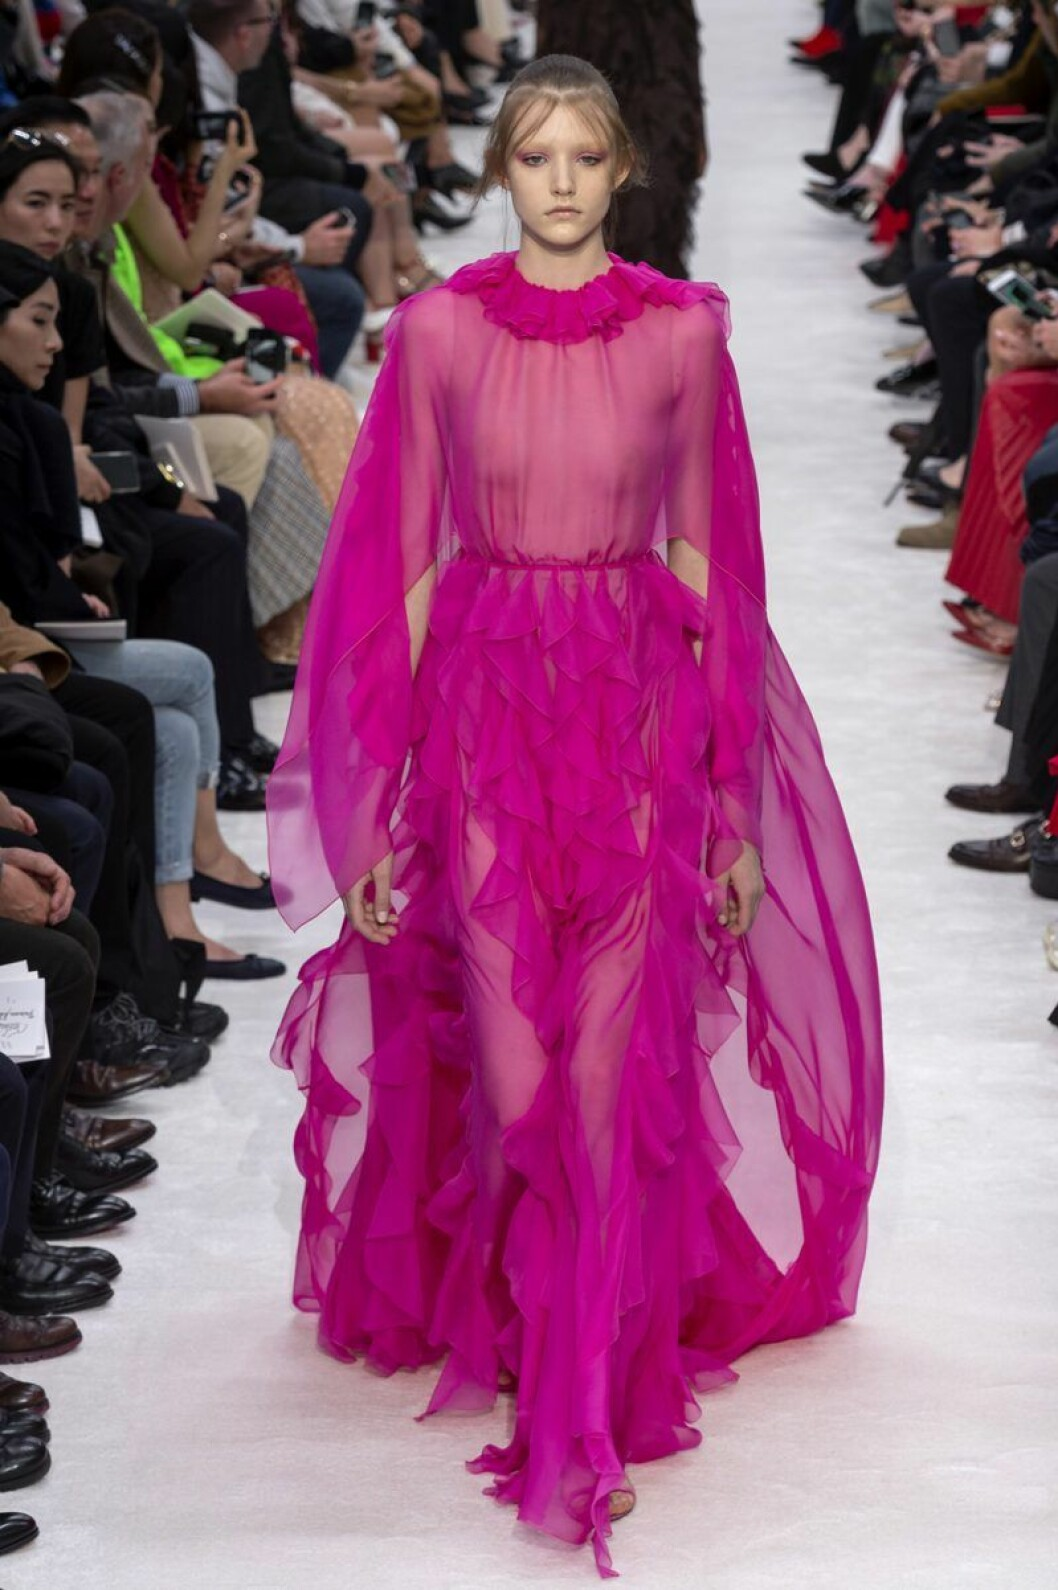 Valentino aw 19 chockrosa klänning